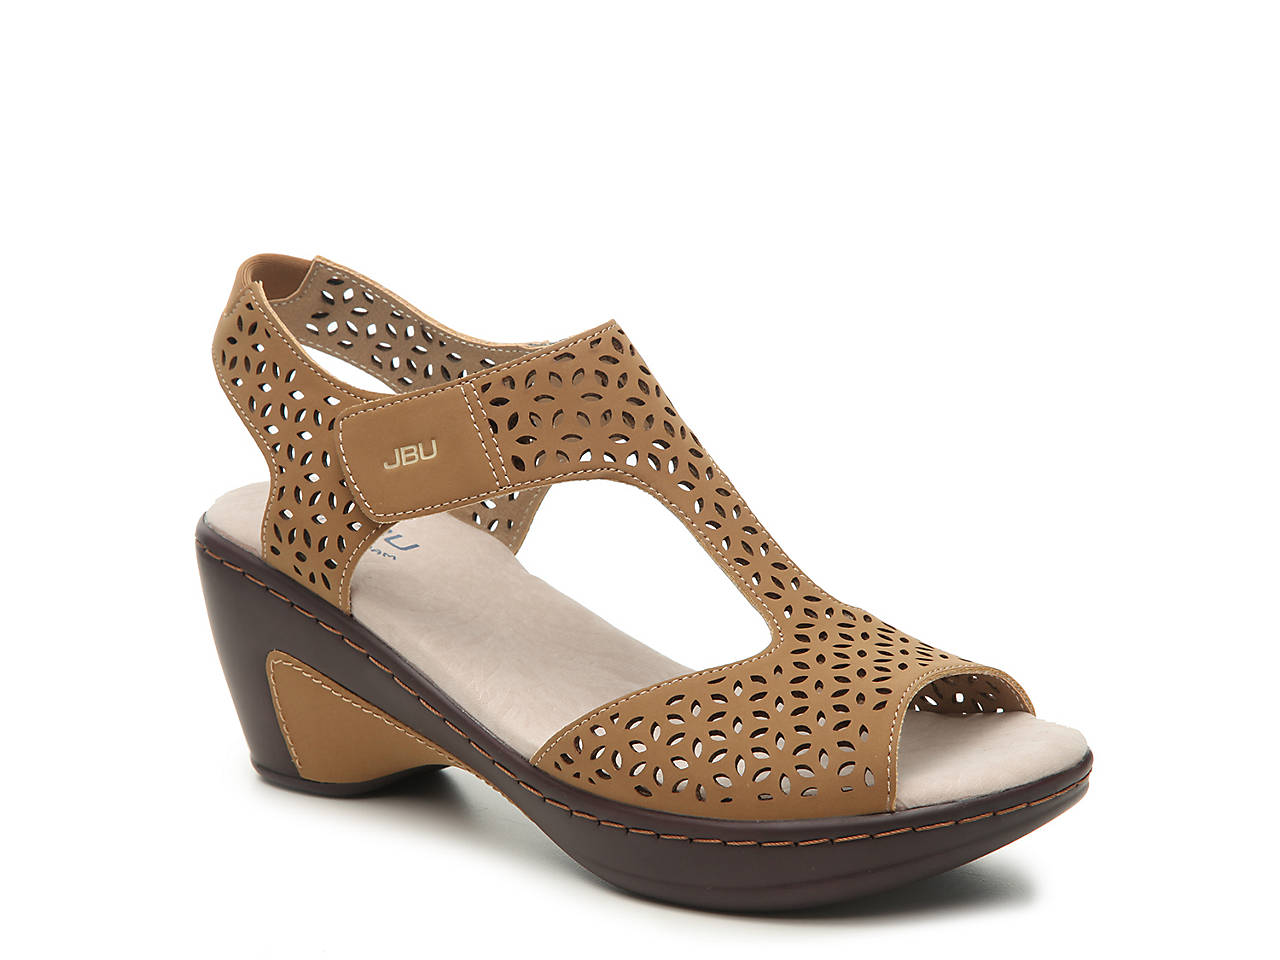 c59a2921175 JBU by Jambu Chloe Wedge Sandal Women s Shoes